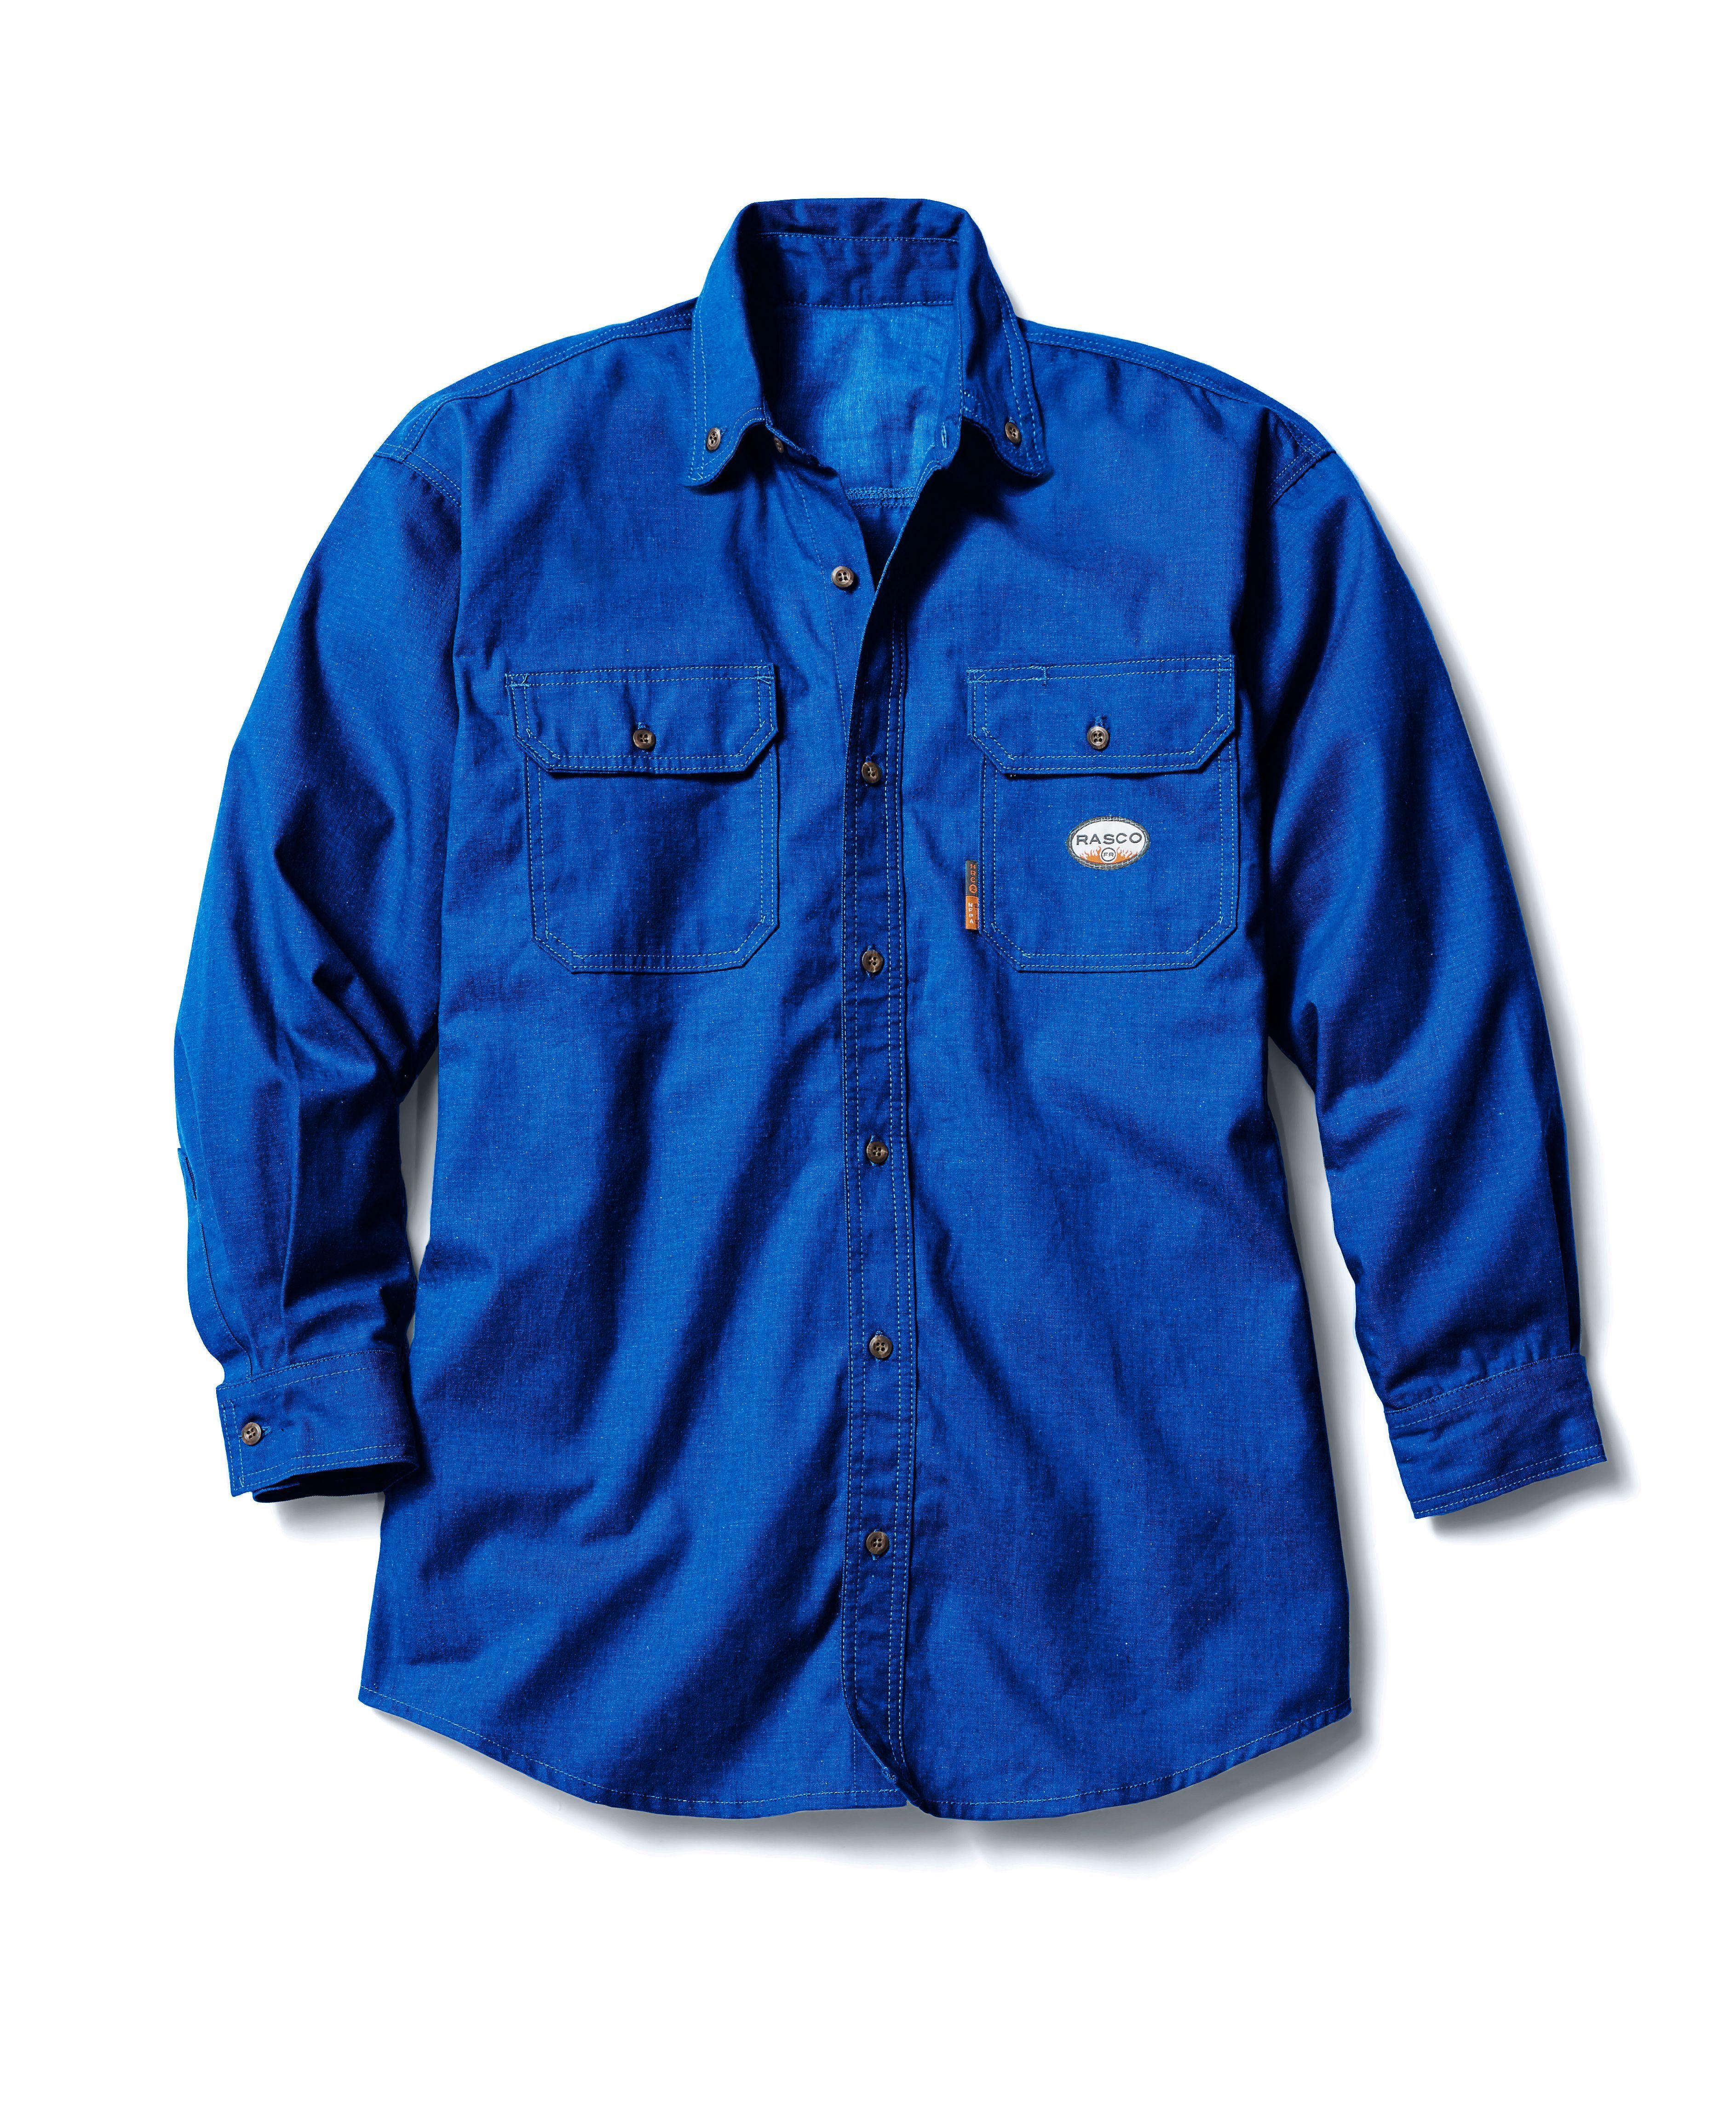 FR 4.5oz Nomex Uniform Shirt-Rasco FR